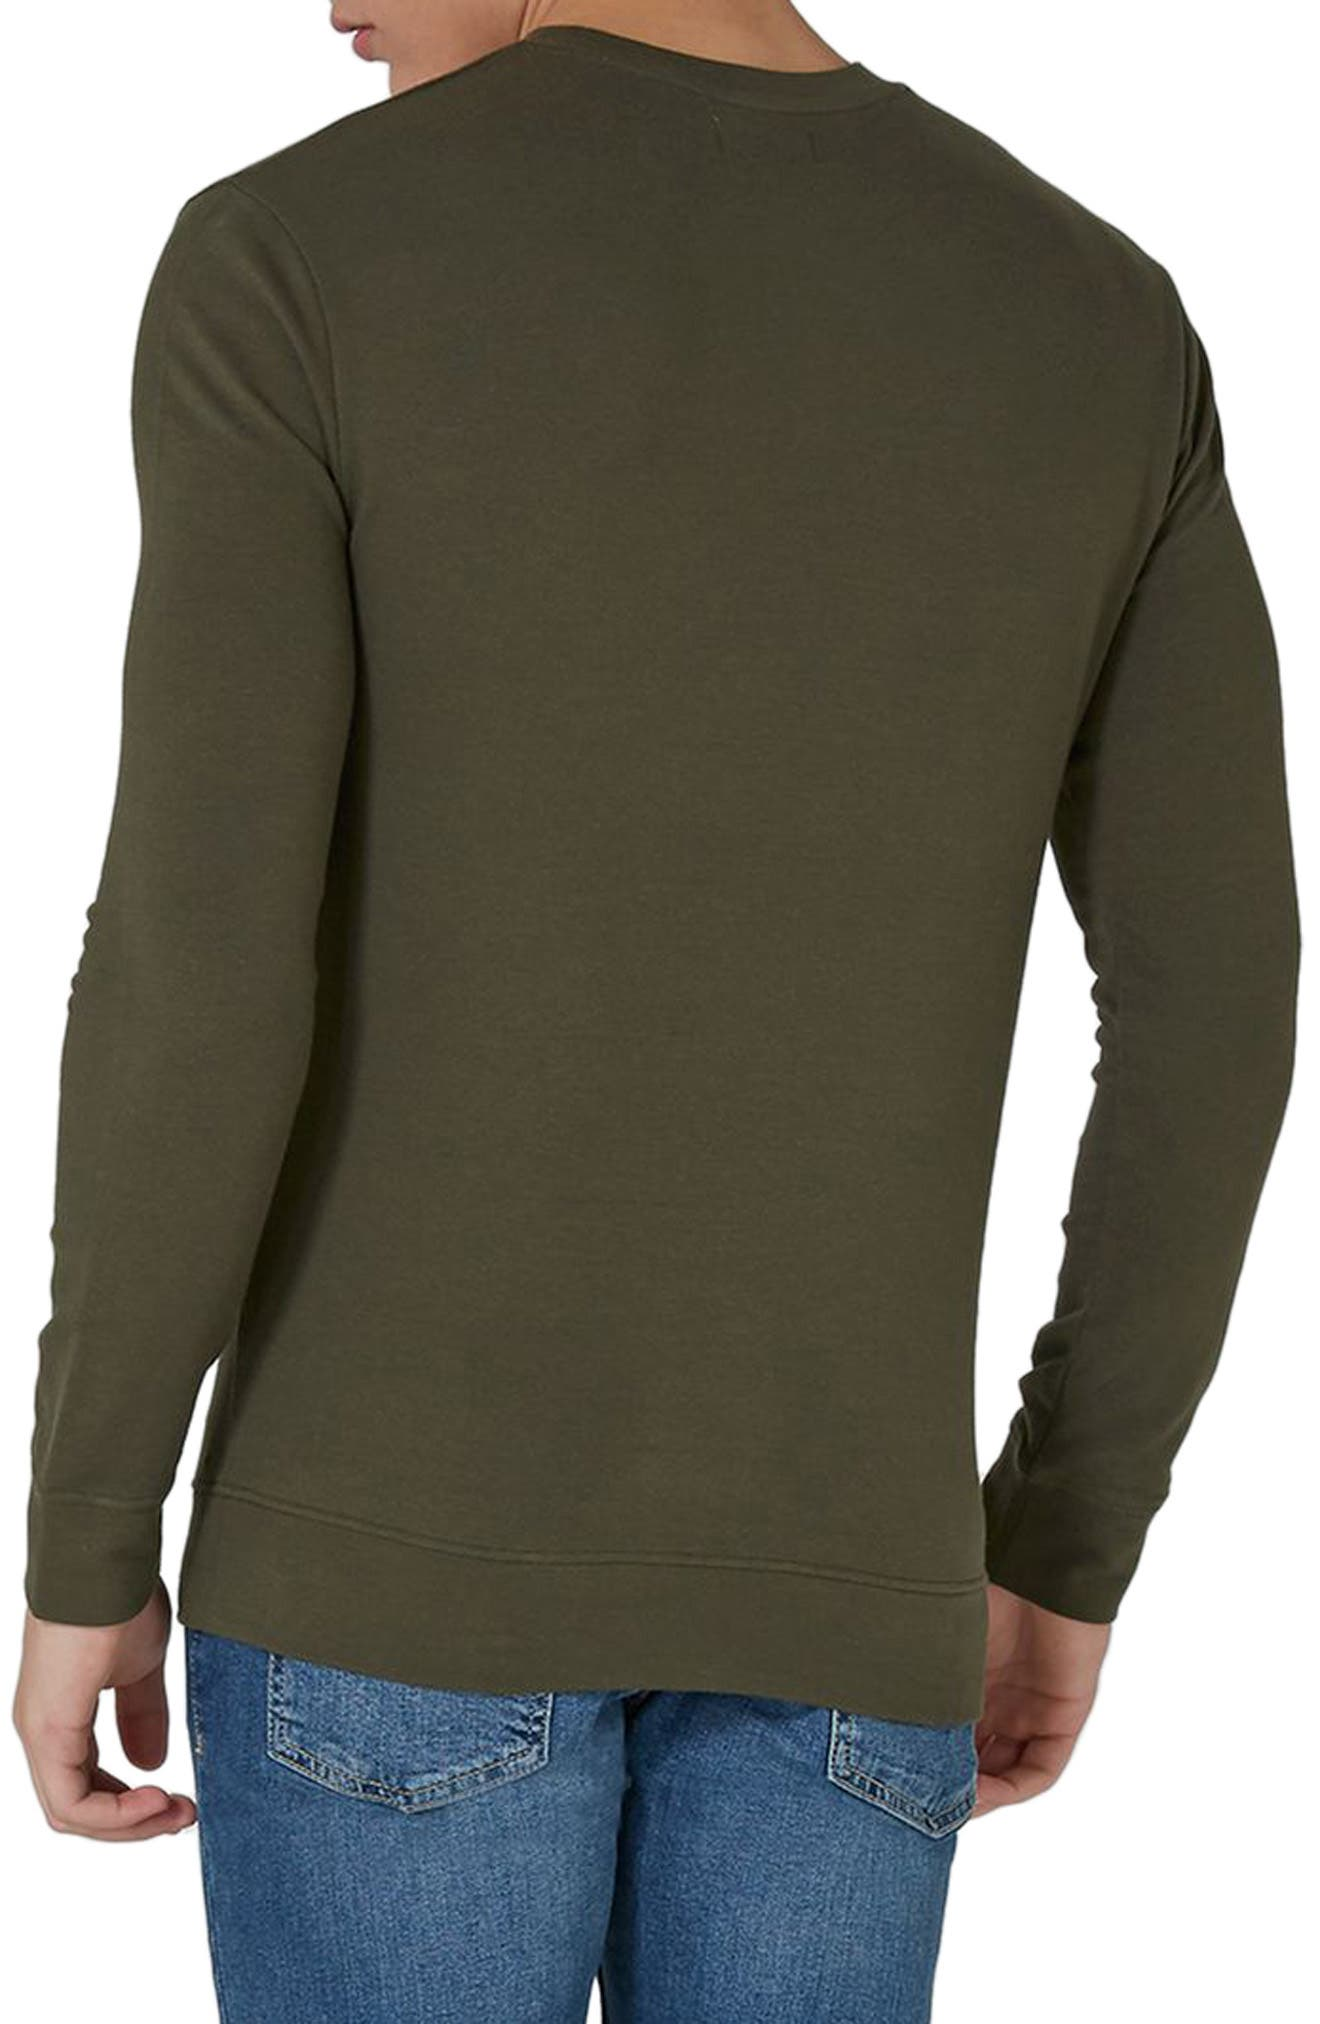 Ultra Muscle Fit Sweatshirt,                             Alternate thumbnail 2, color,                             300